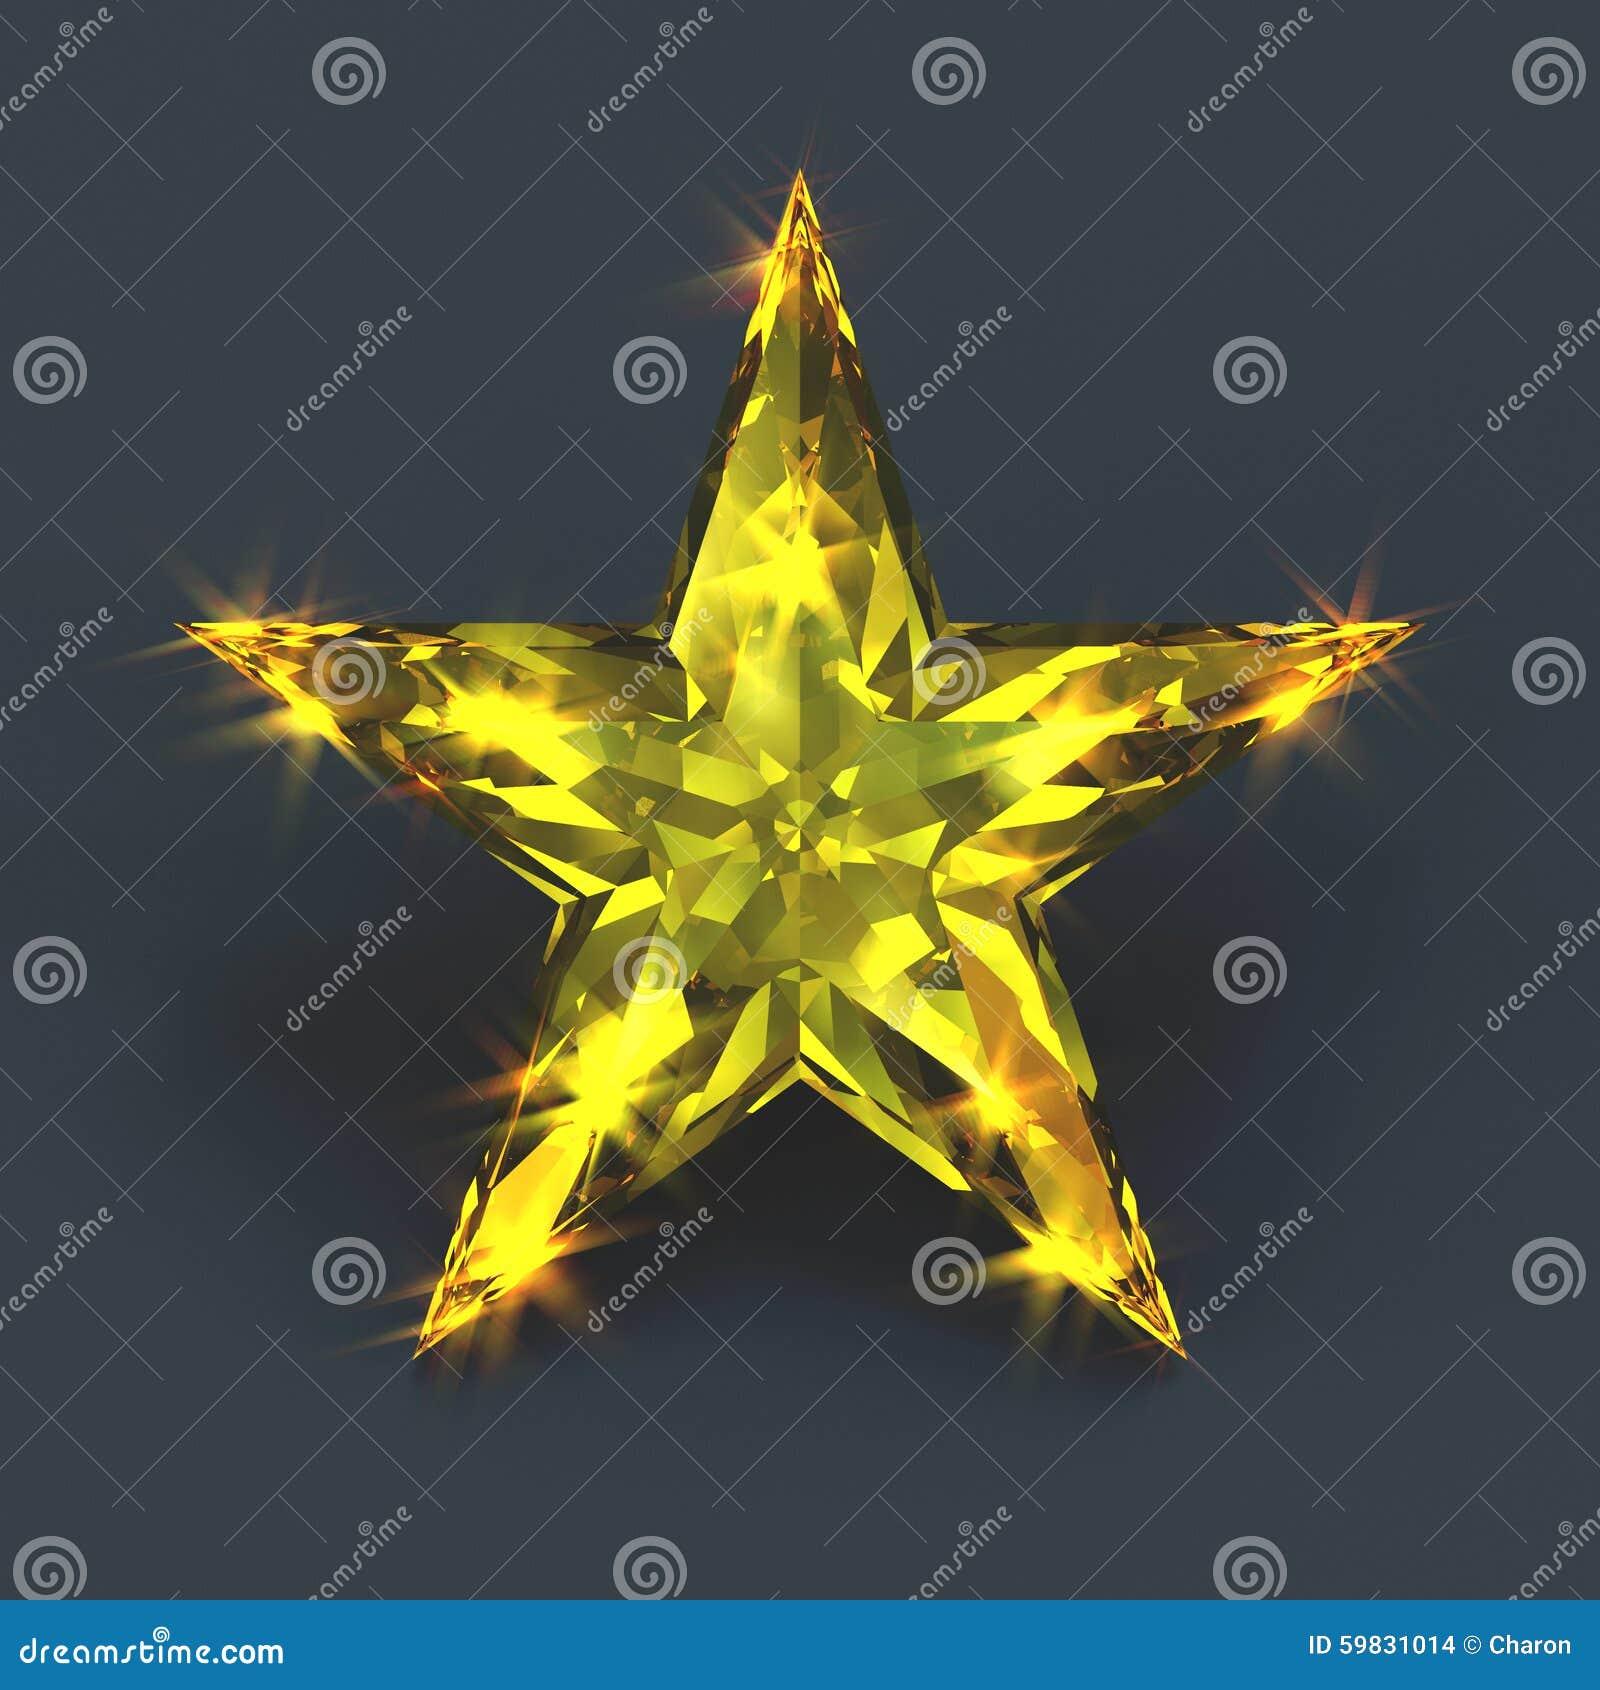 sparkling shiny yellow star gemstone stock illustration. Black Bedroom Furniture Sets. Home Design Ideas